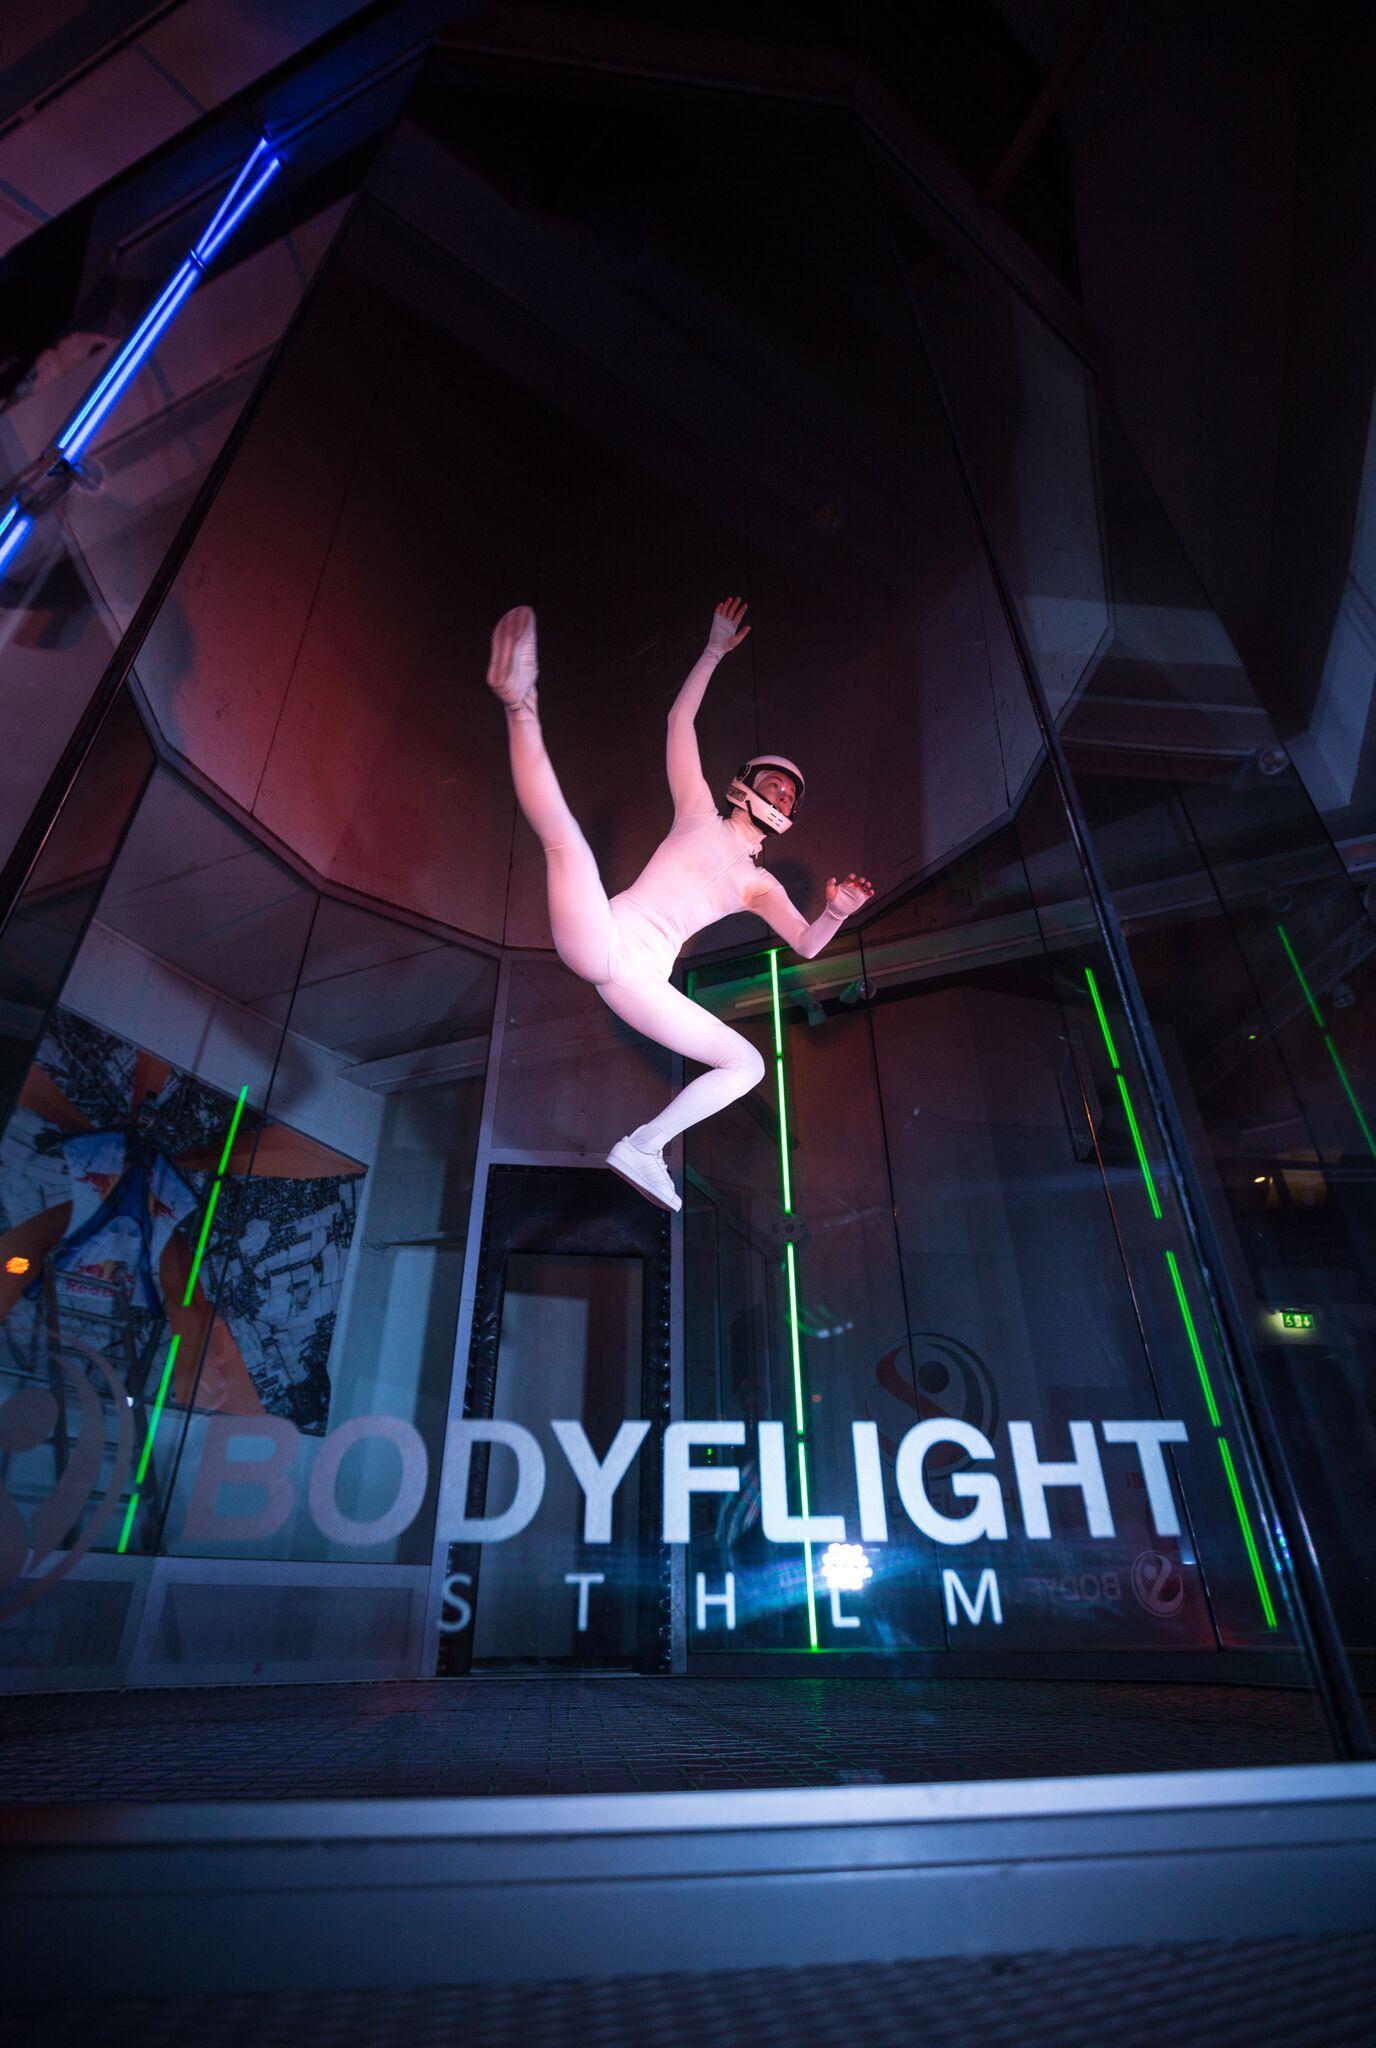 Bodyflight STHLM